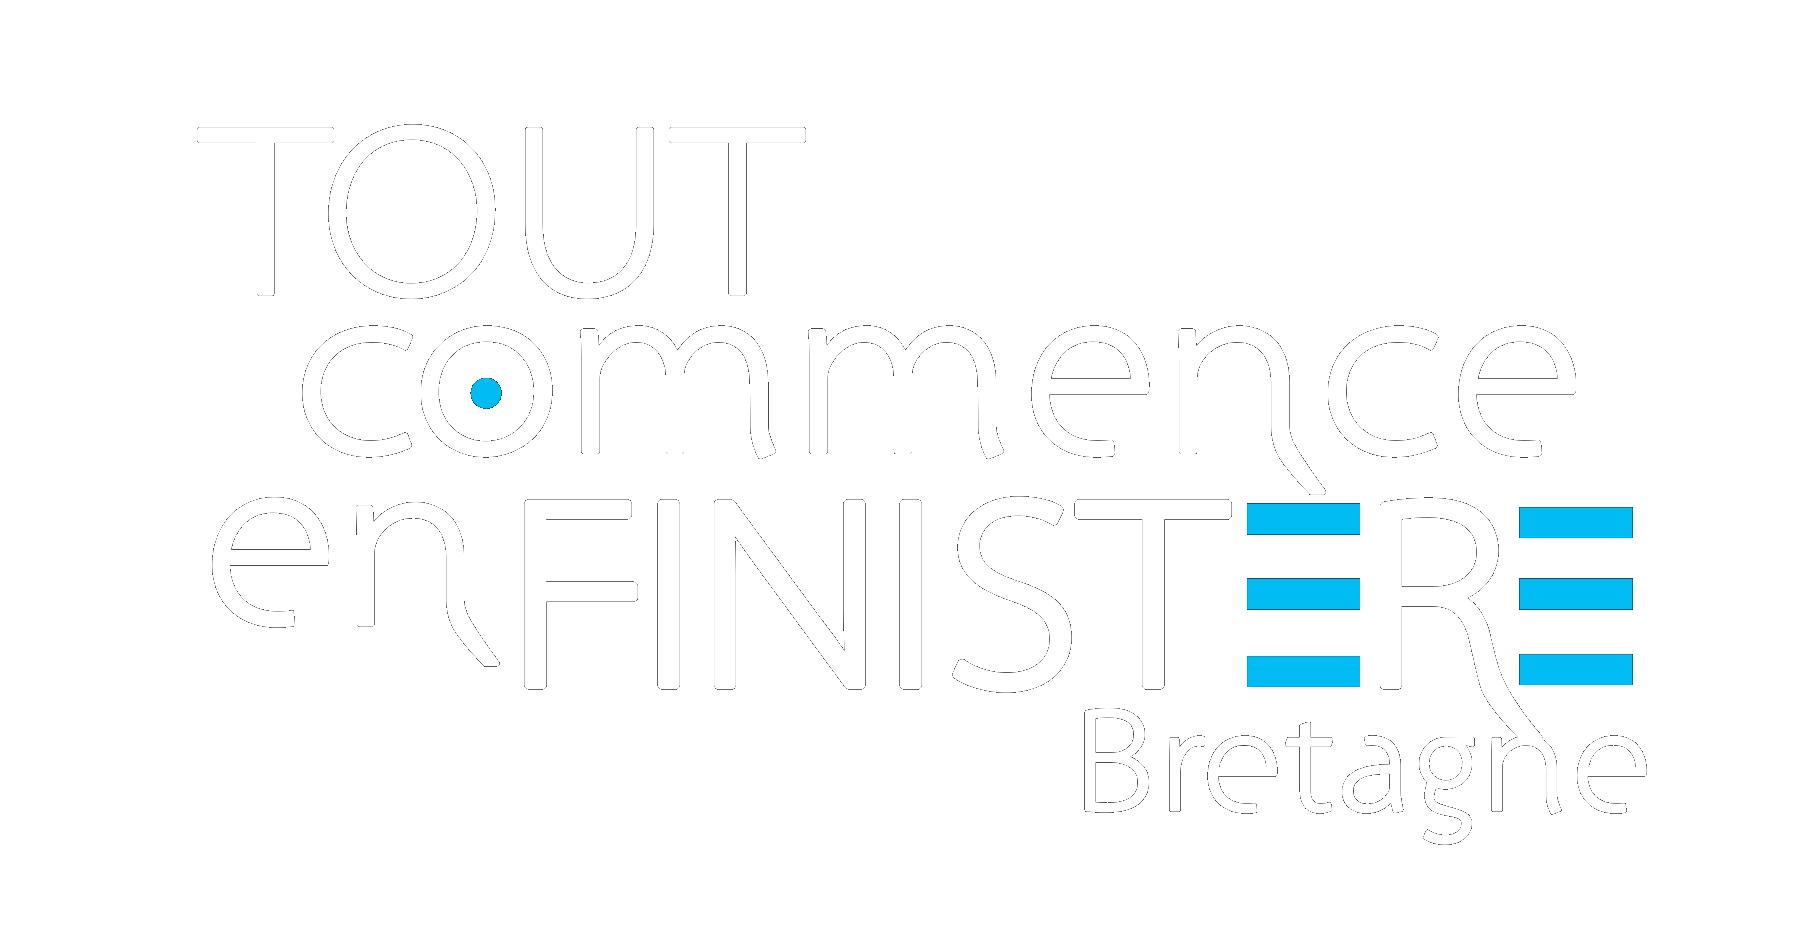 BLOC-TCF-mention-Bretagne-QUADRI-FOND-transparent-lettres-blanchesWEB